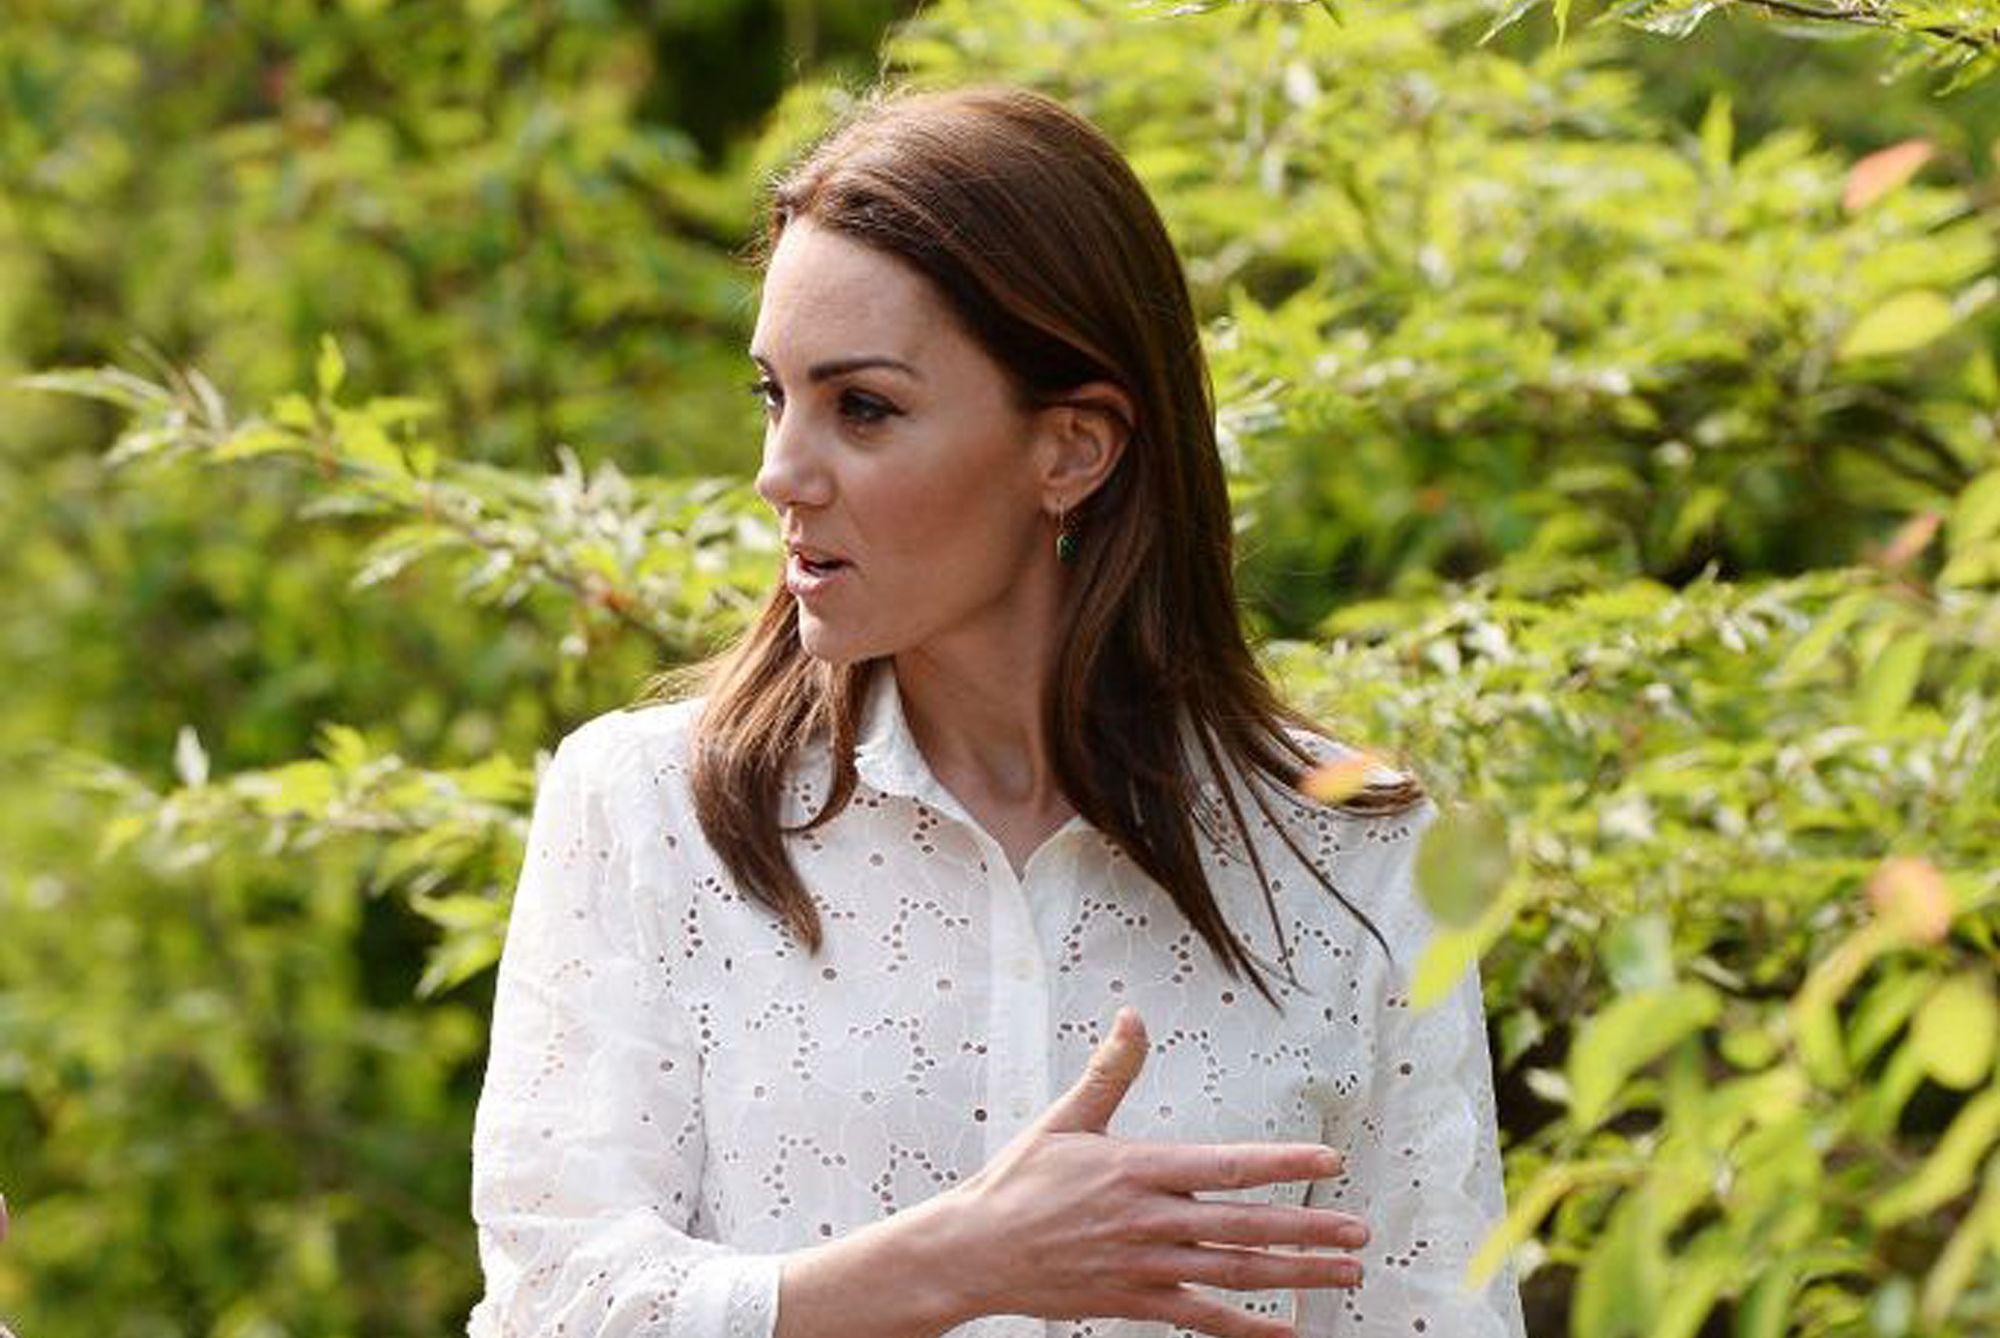 Duchess of Cambridge's Chelsea Flower Show garden to relocate to Devon